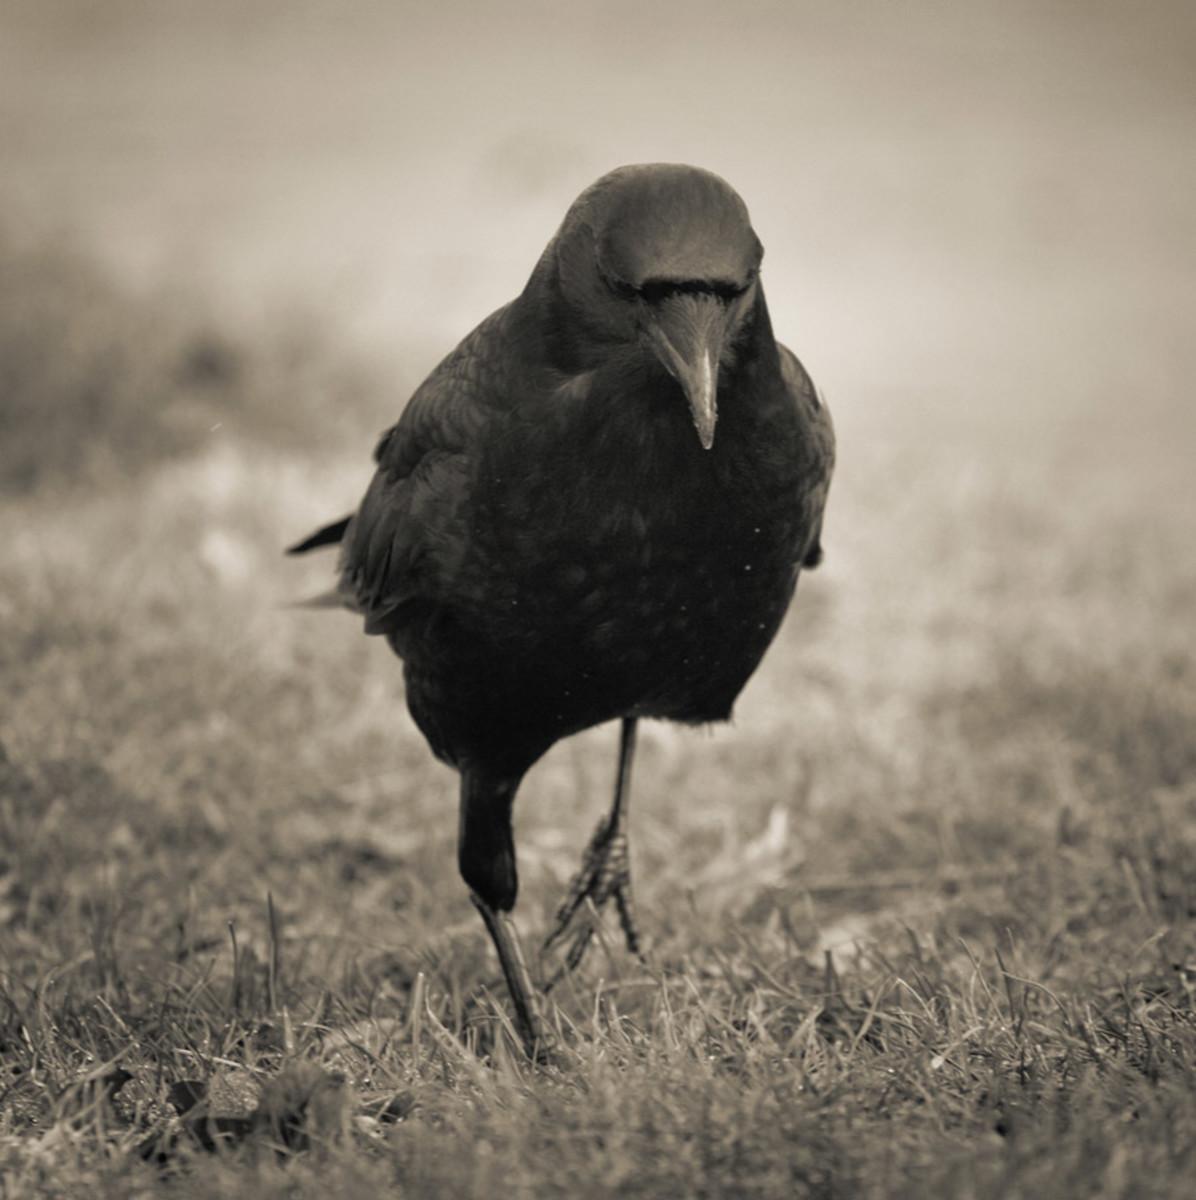 http://flickrfy.com/blog/category/birds/   ---   Christopher Perez (Christopher's Odds & Ends):